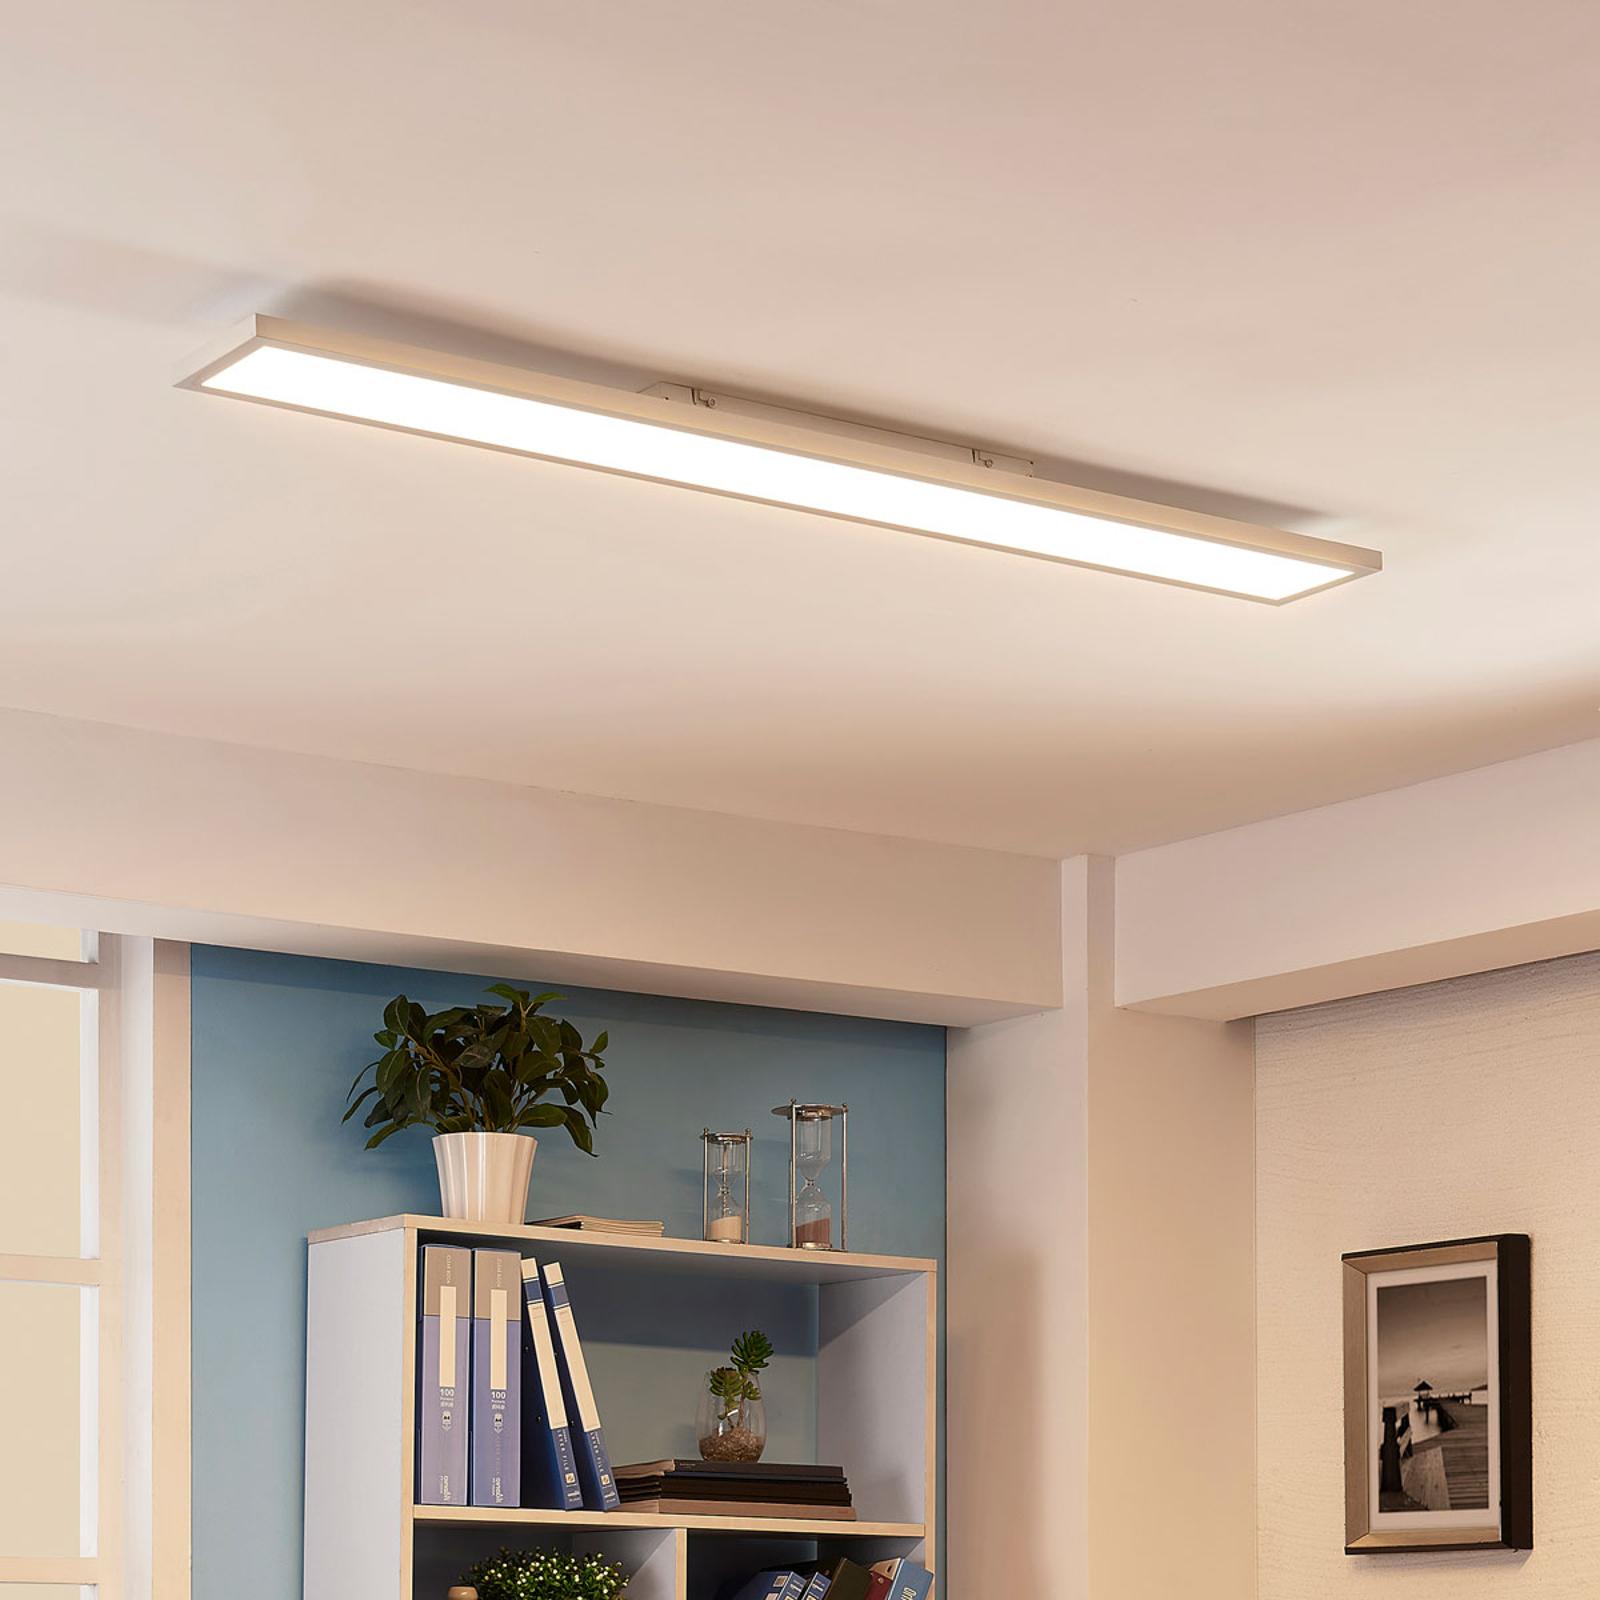 Längliche LED-Deckenlampe Enora, 40 W